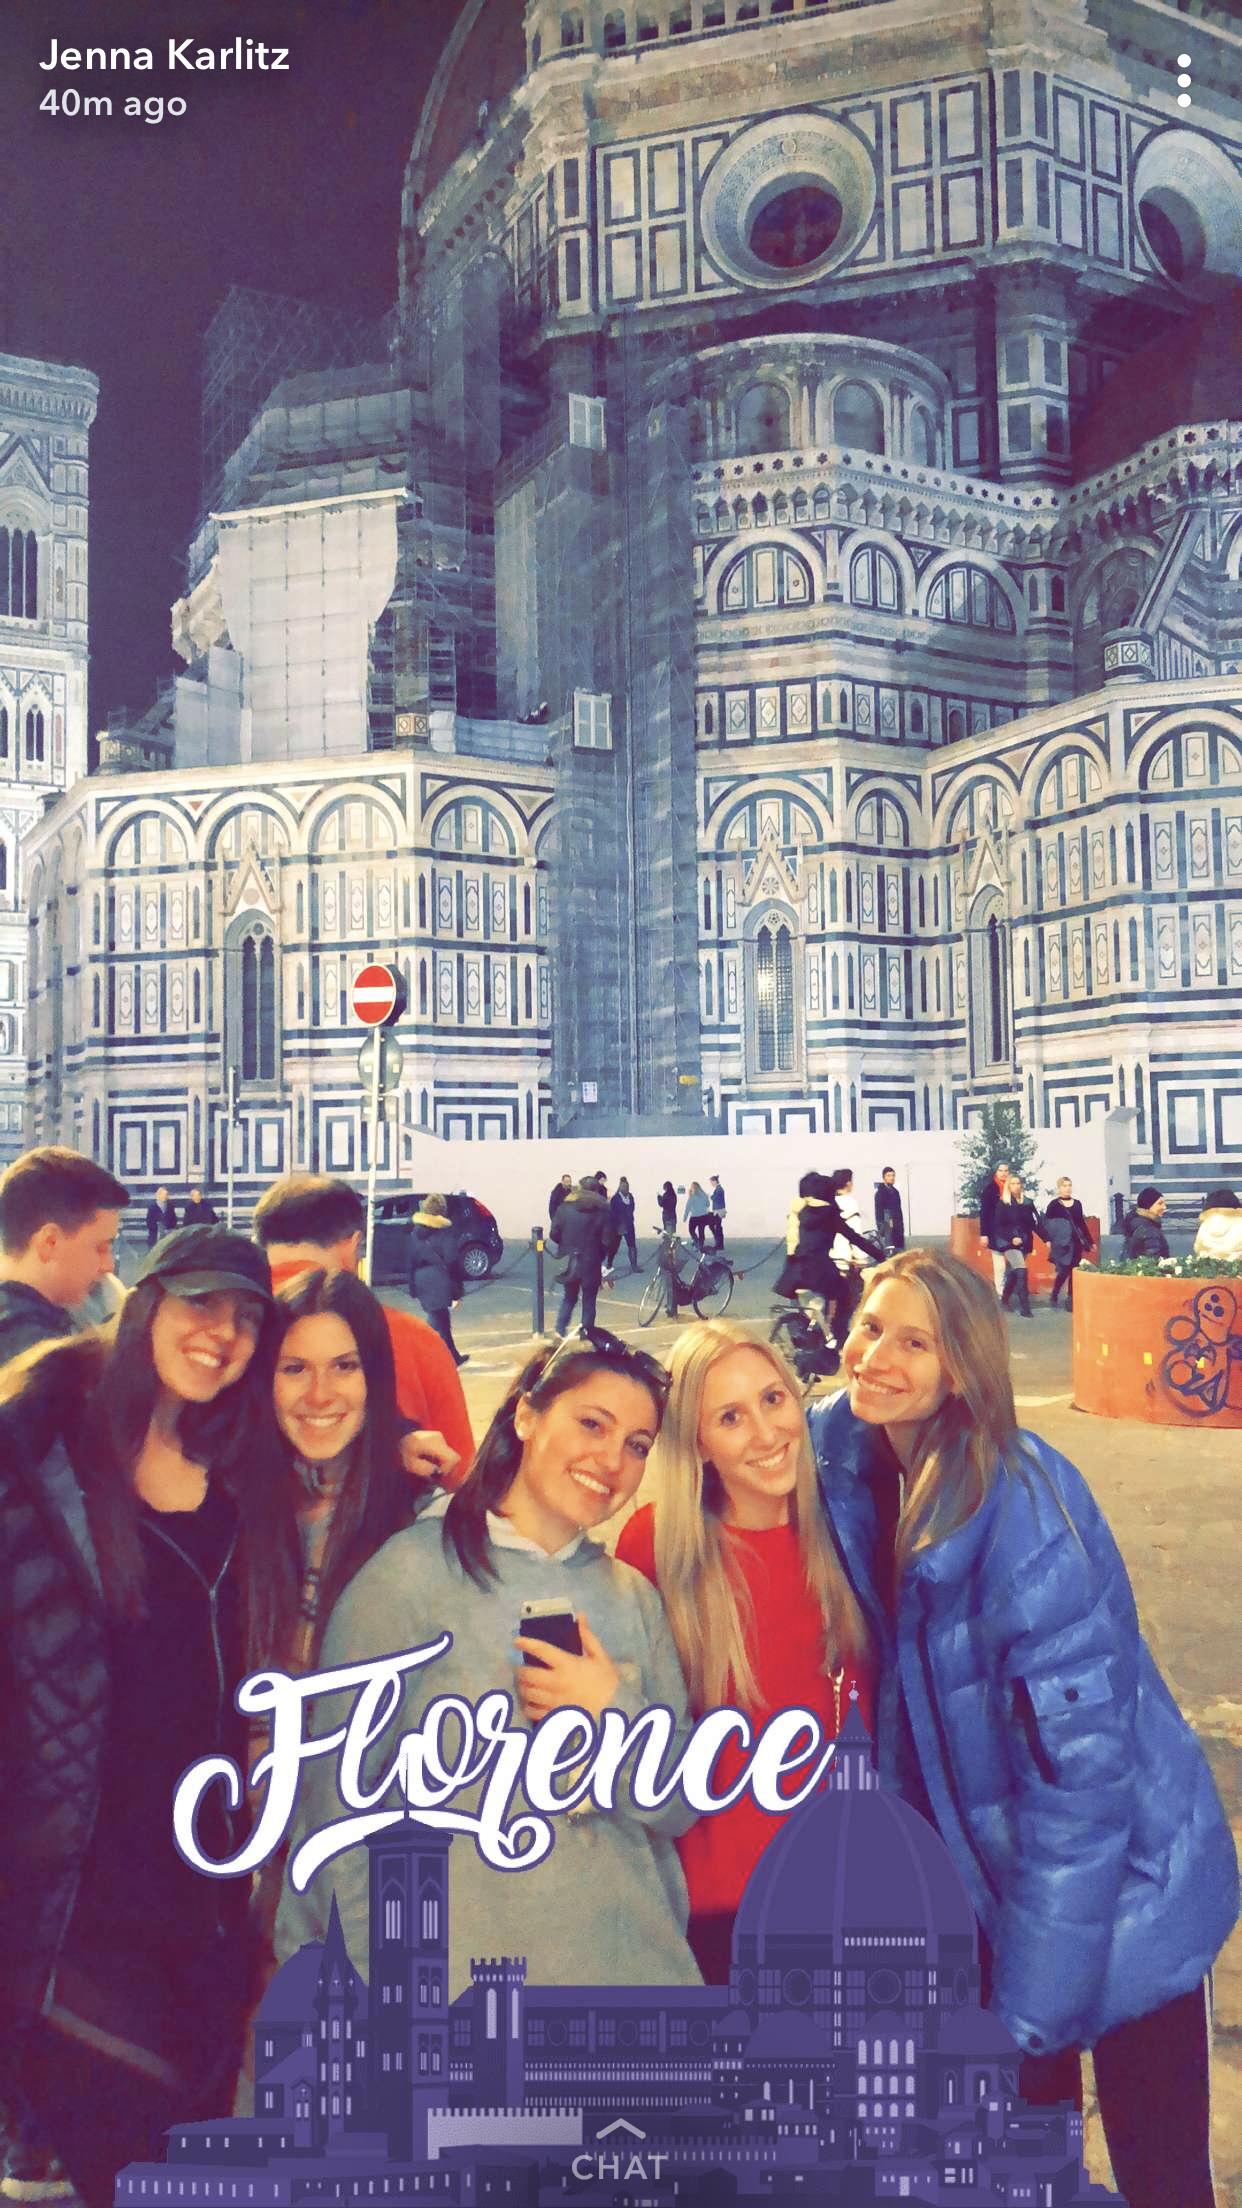 Roommates & Duomo